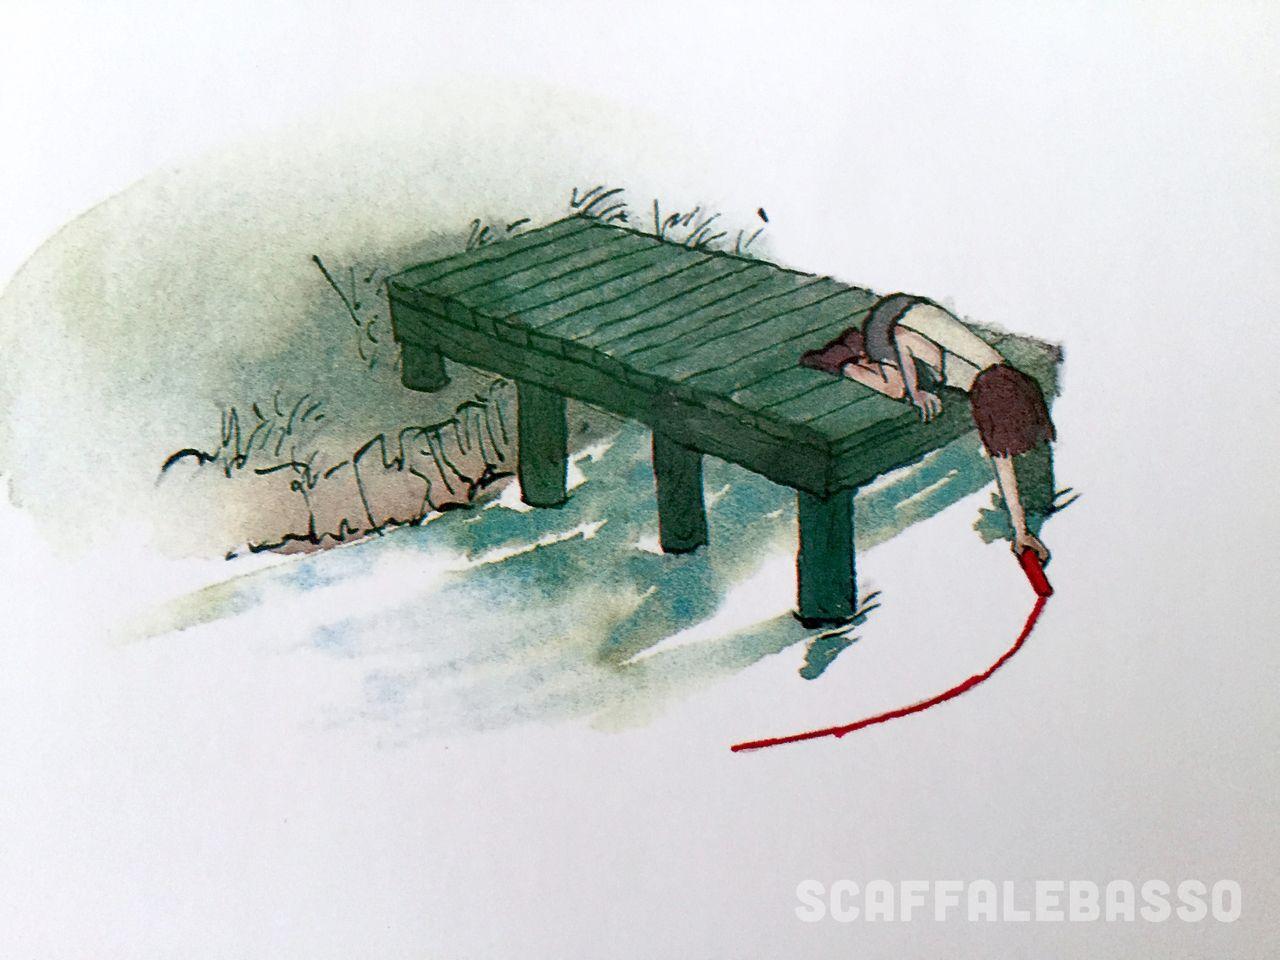 Aaron Becker, Viaggio, Feltrinelli